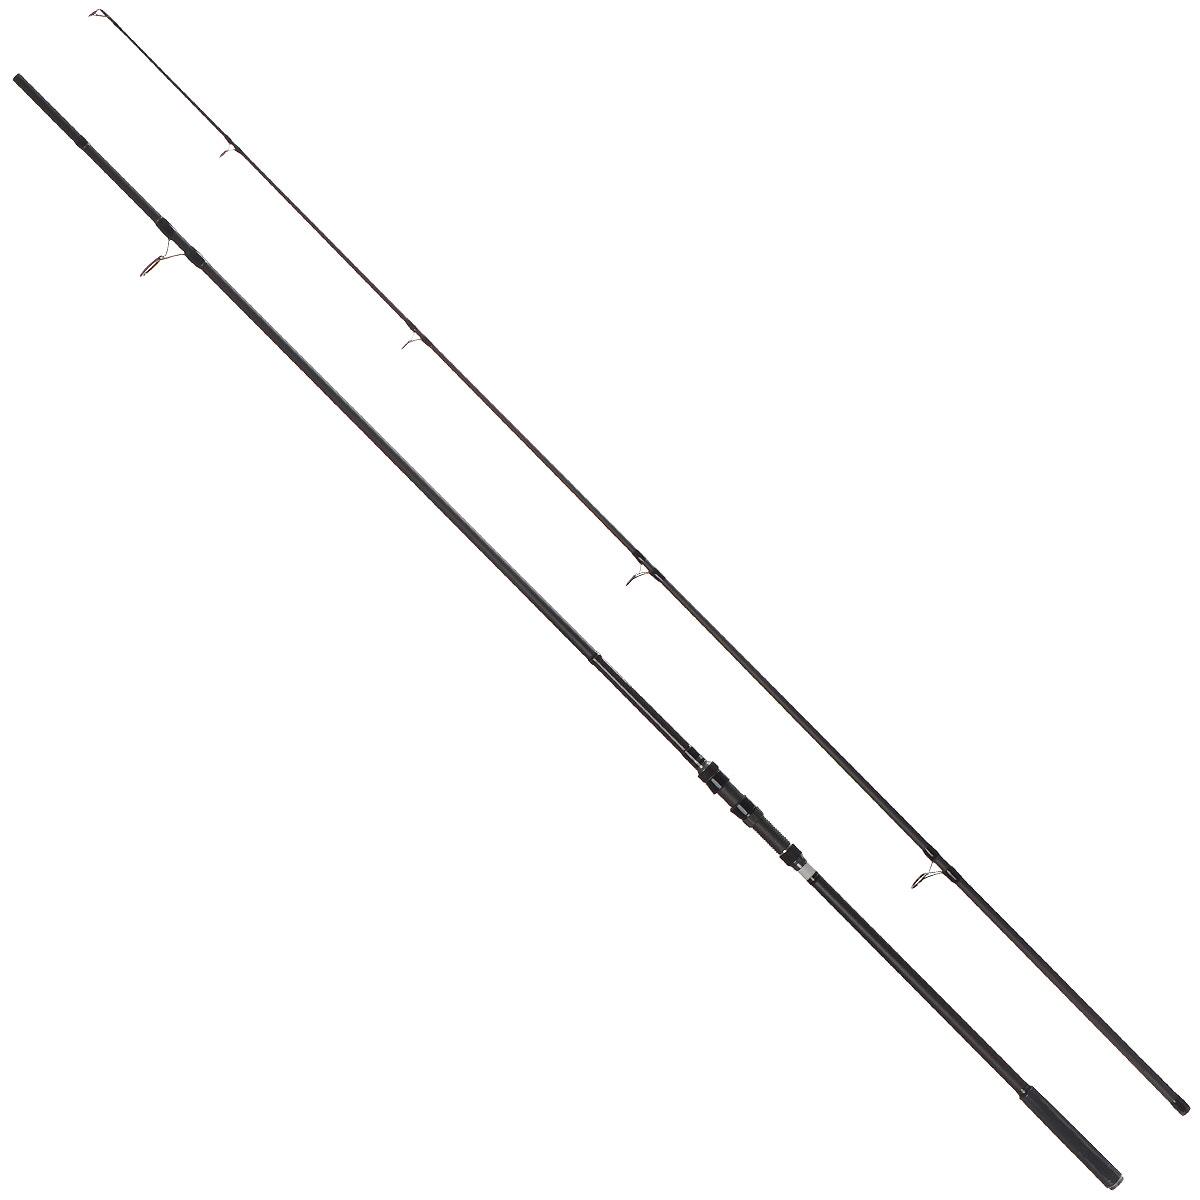 Удилище карповое Daiwa Windcast Carp, 3,6 м, 4,5 lbs